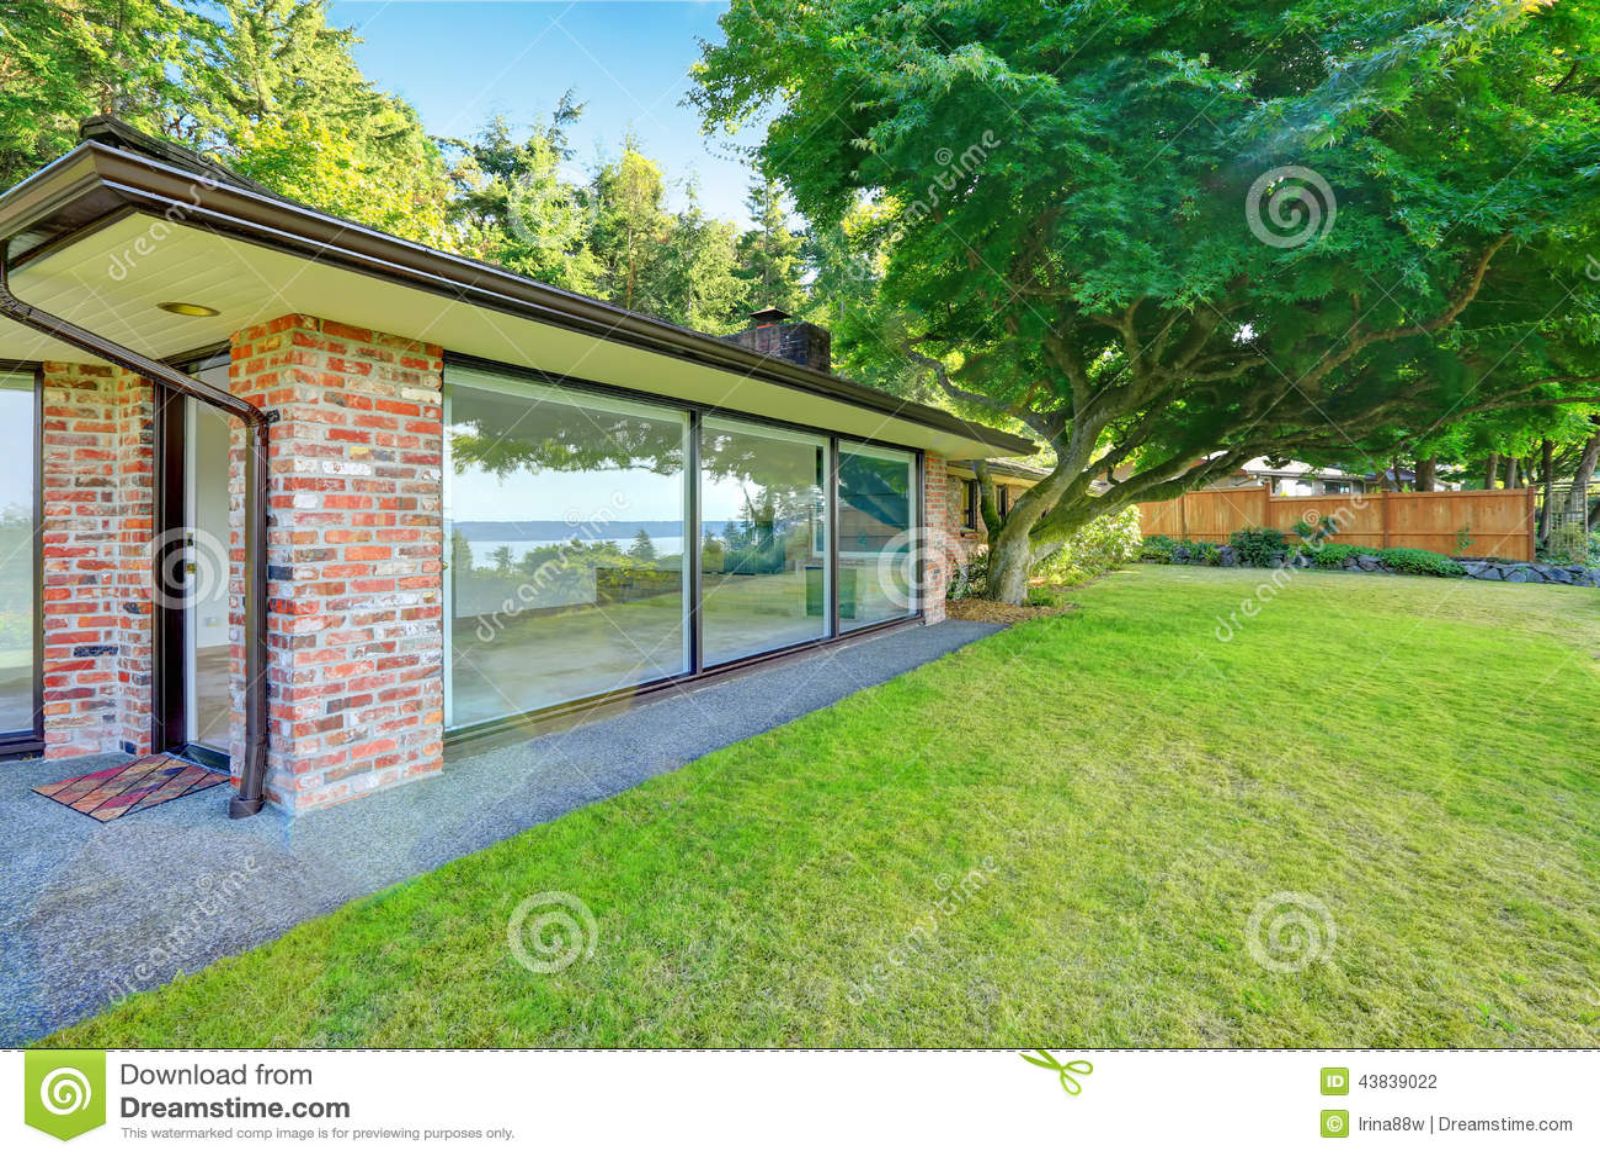 Casa Bonita Do Tijolo Com Paredes De Vidro Opini O Do Quintal Foto